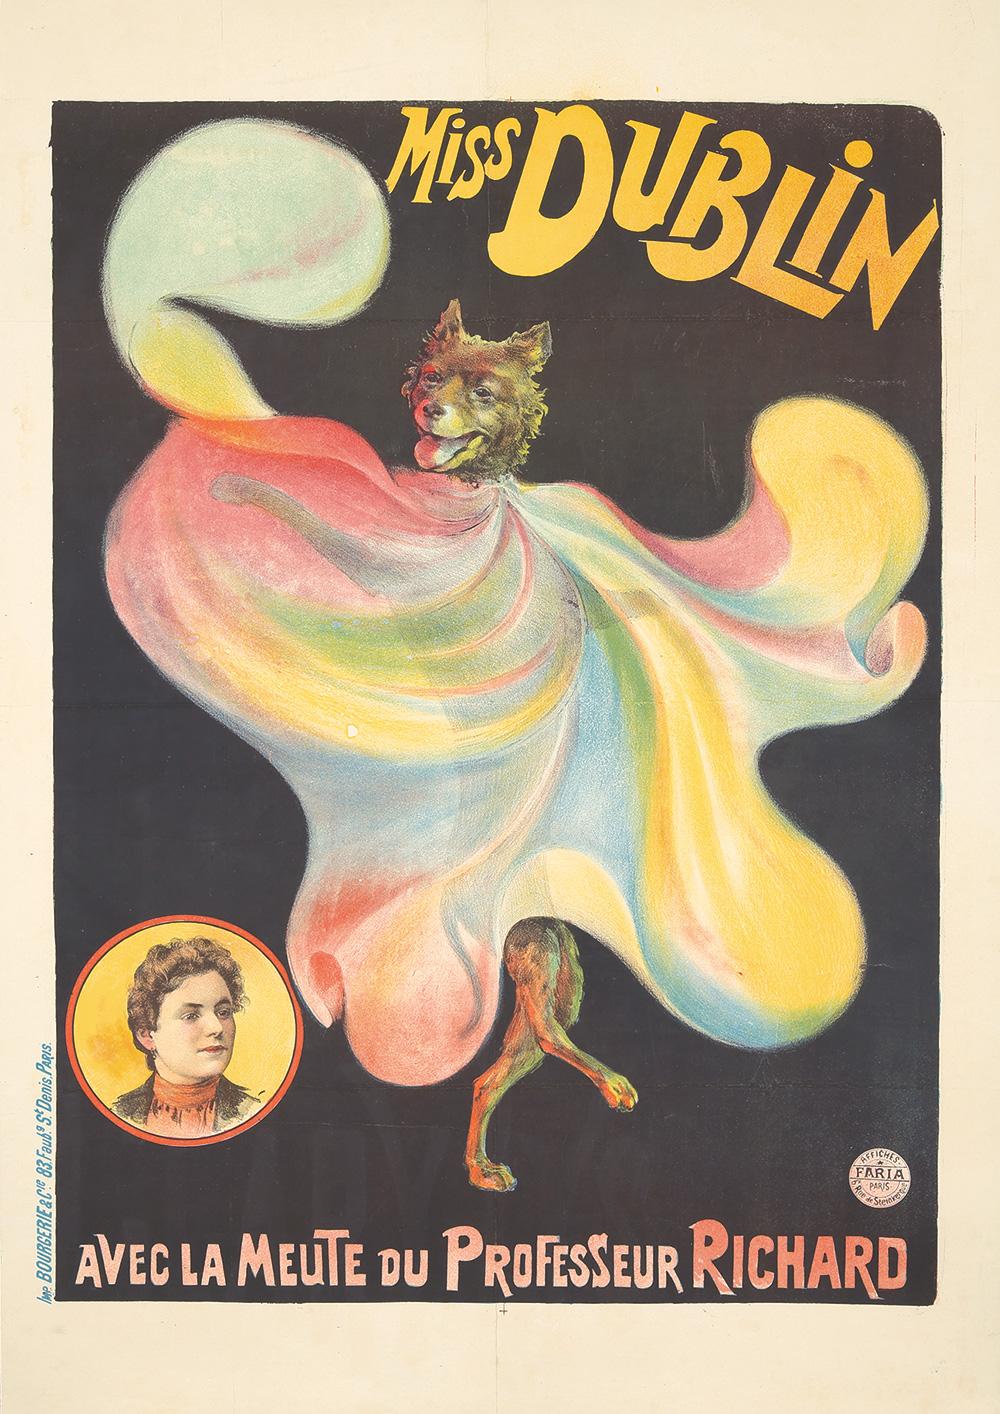 112. Miss Dublin. ca. 1890s.